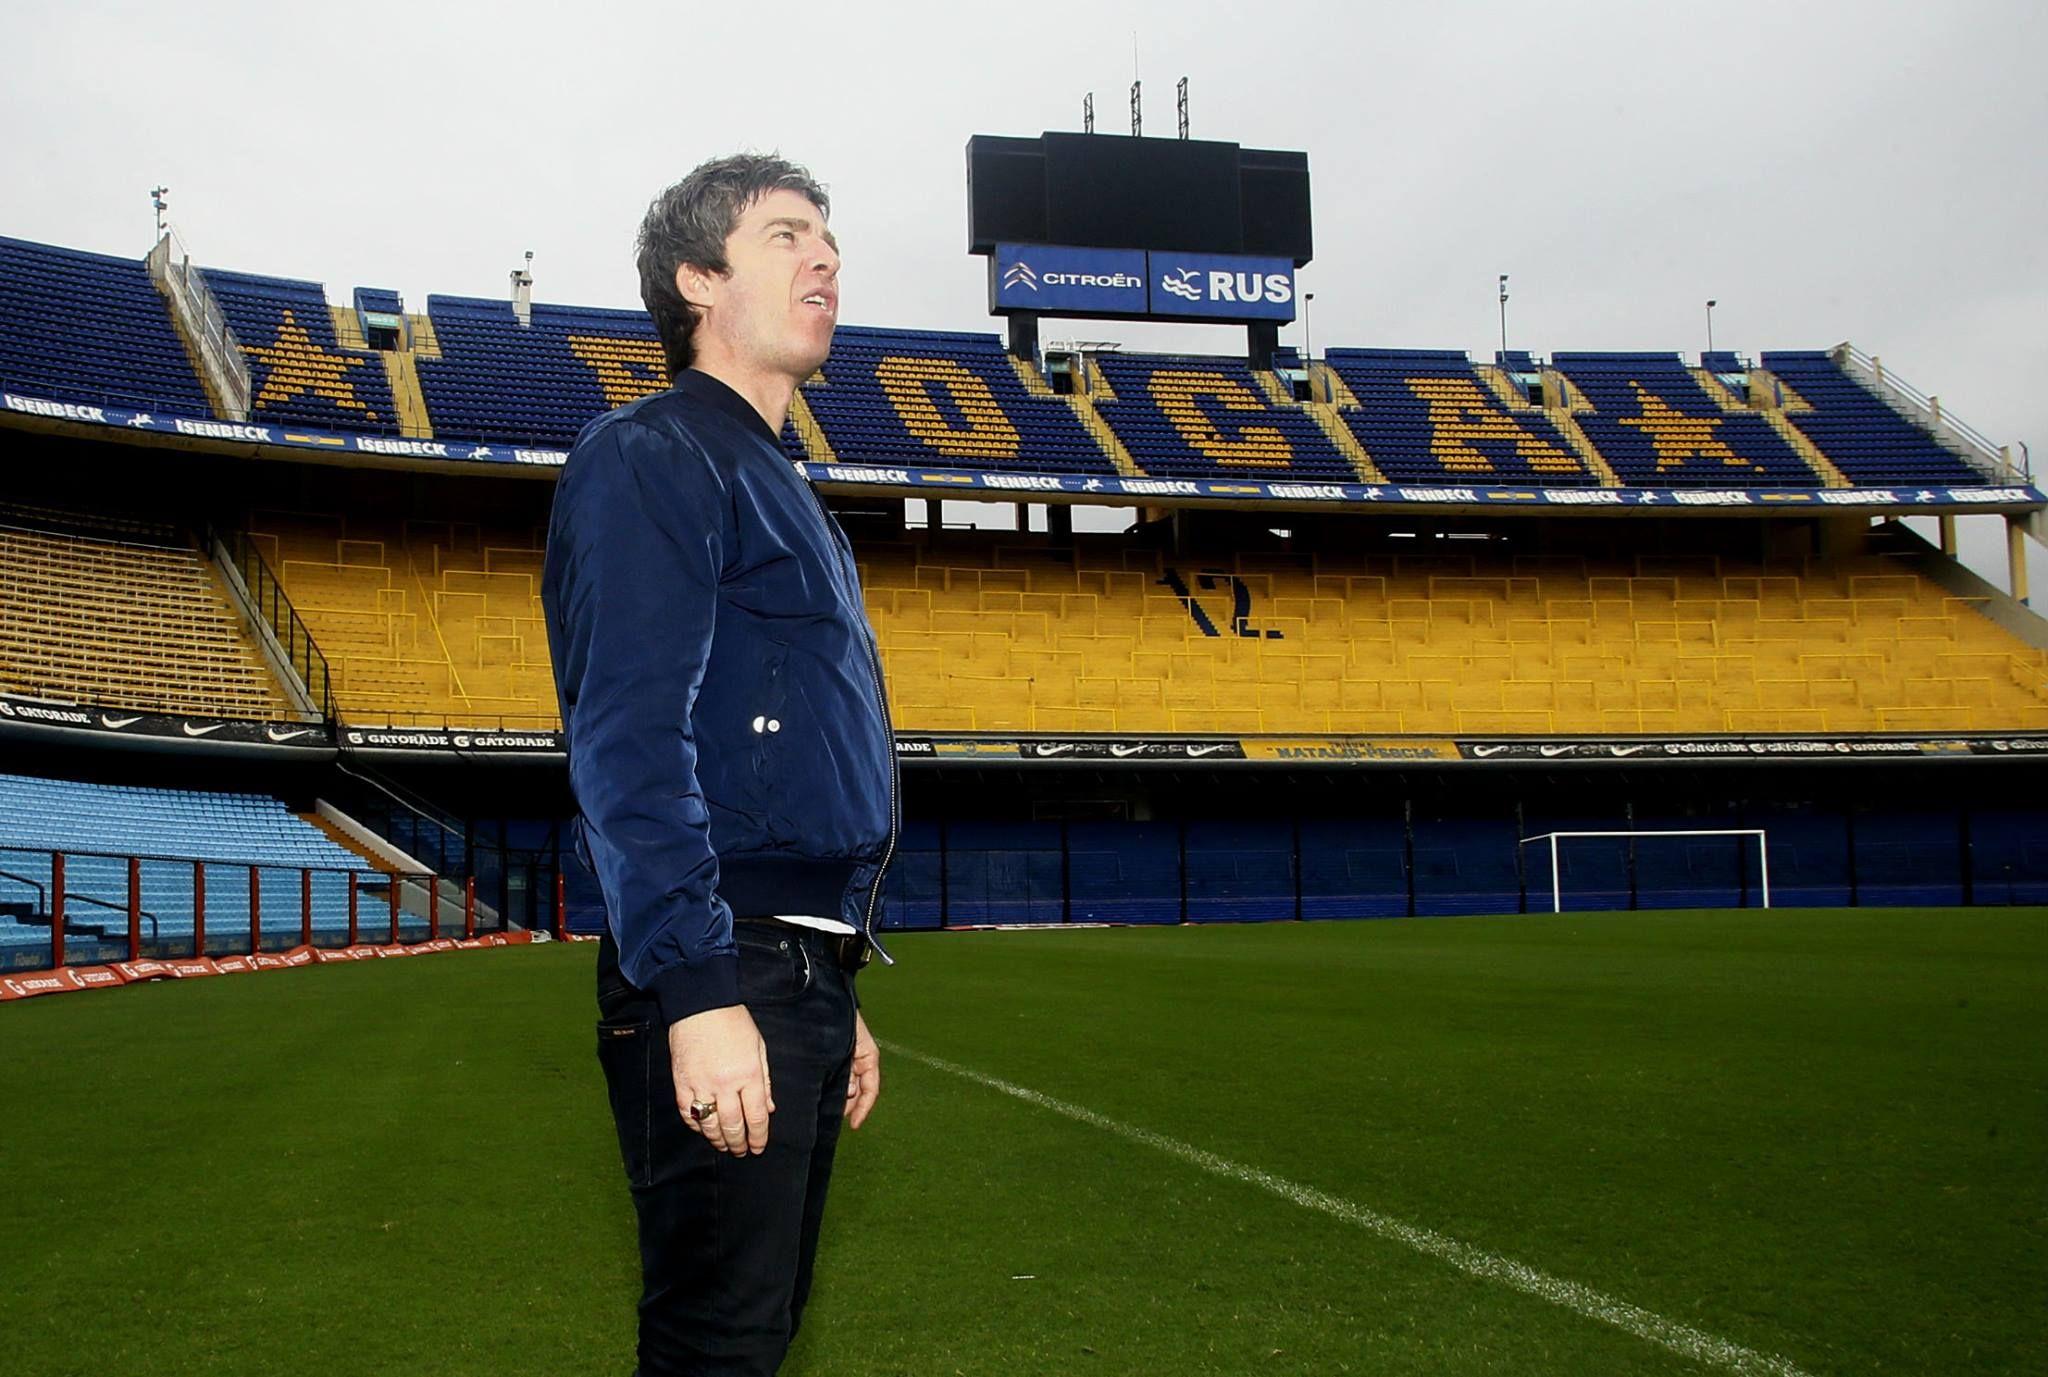 Aseguran que el músico inglés se emocionó cuando pisó la cancha de Boca. Foto prensa Boca Juniors.